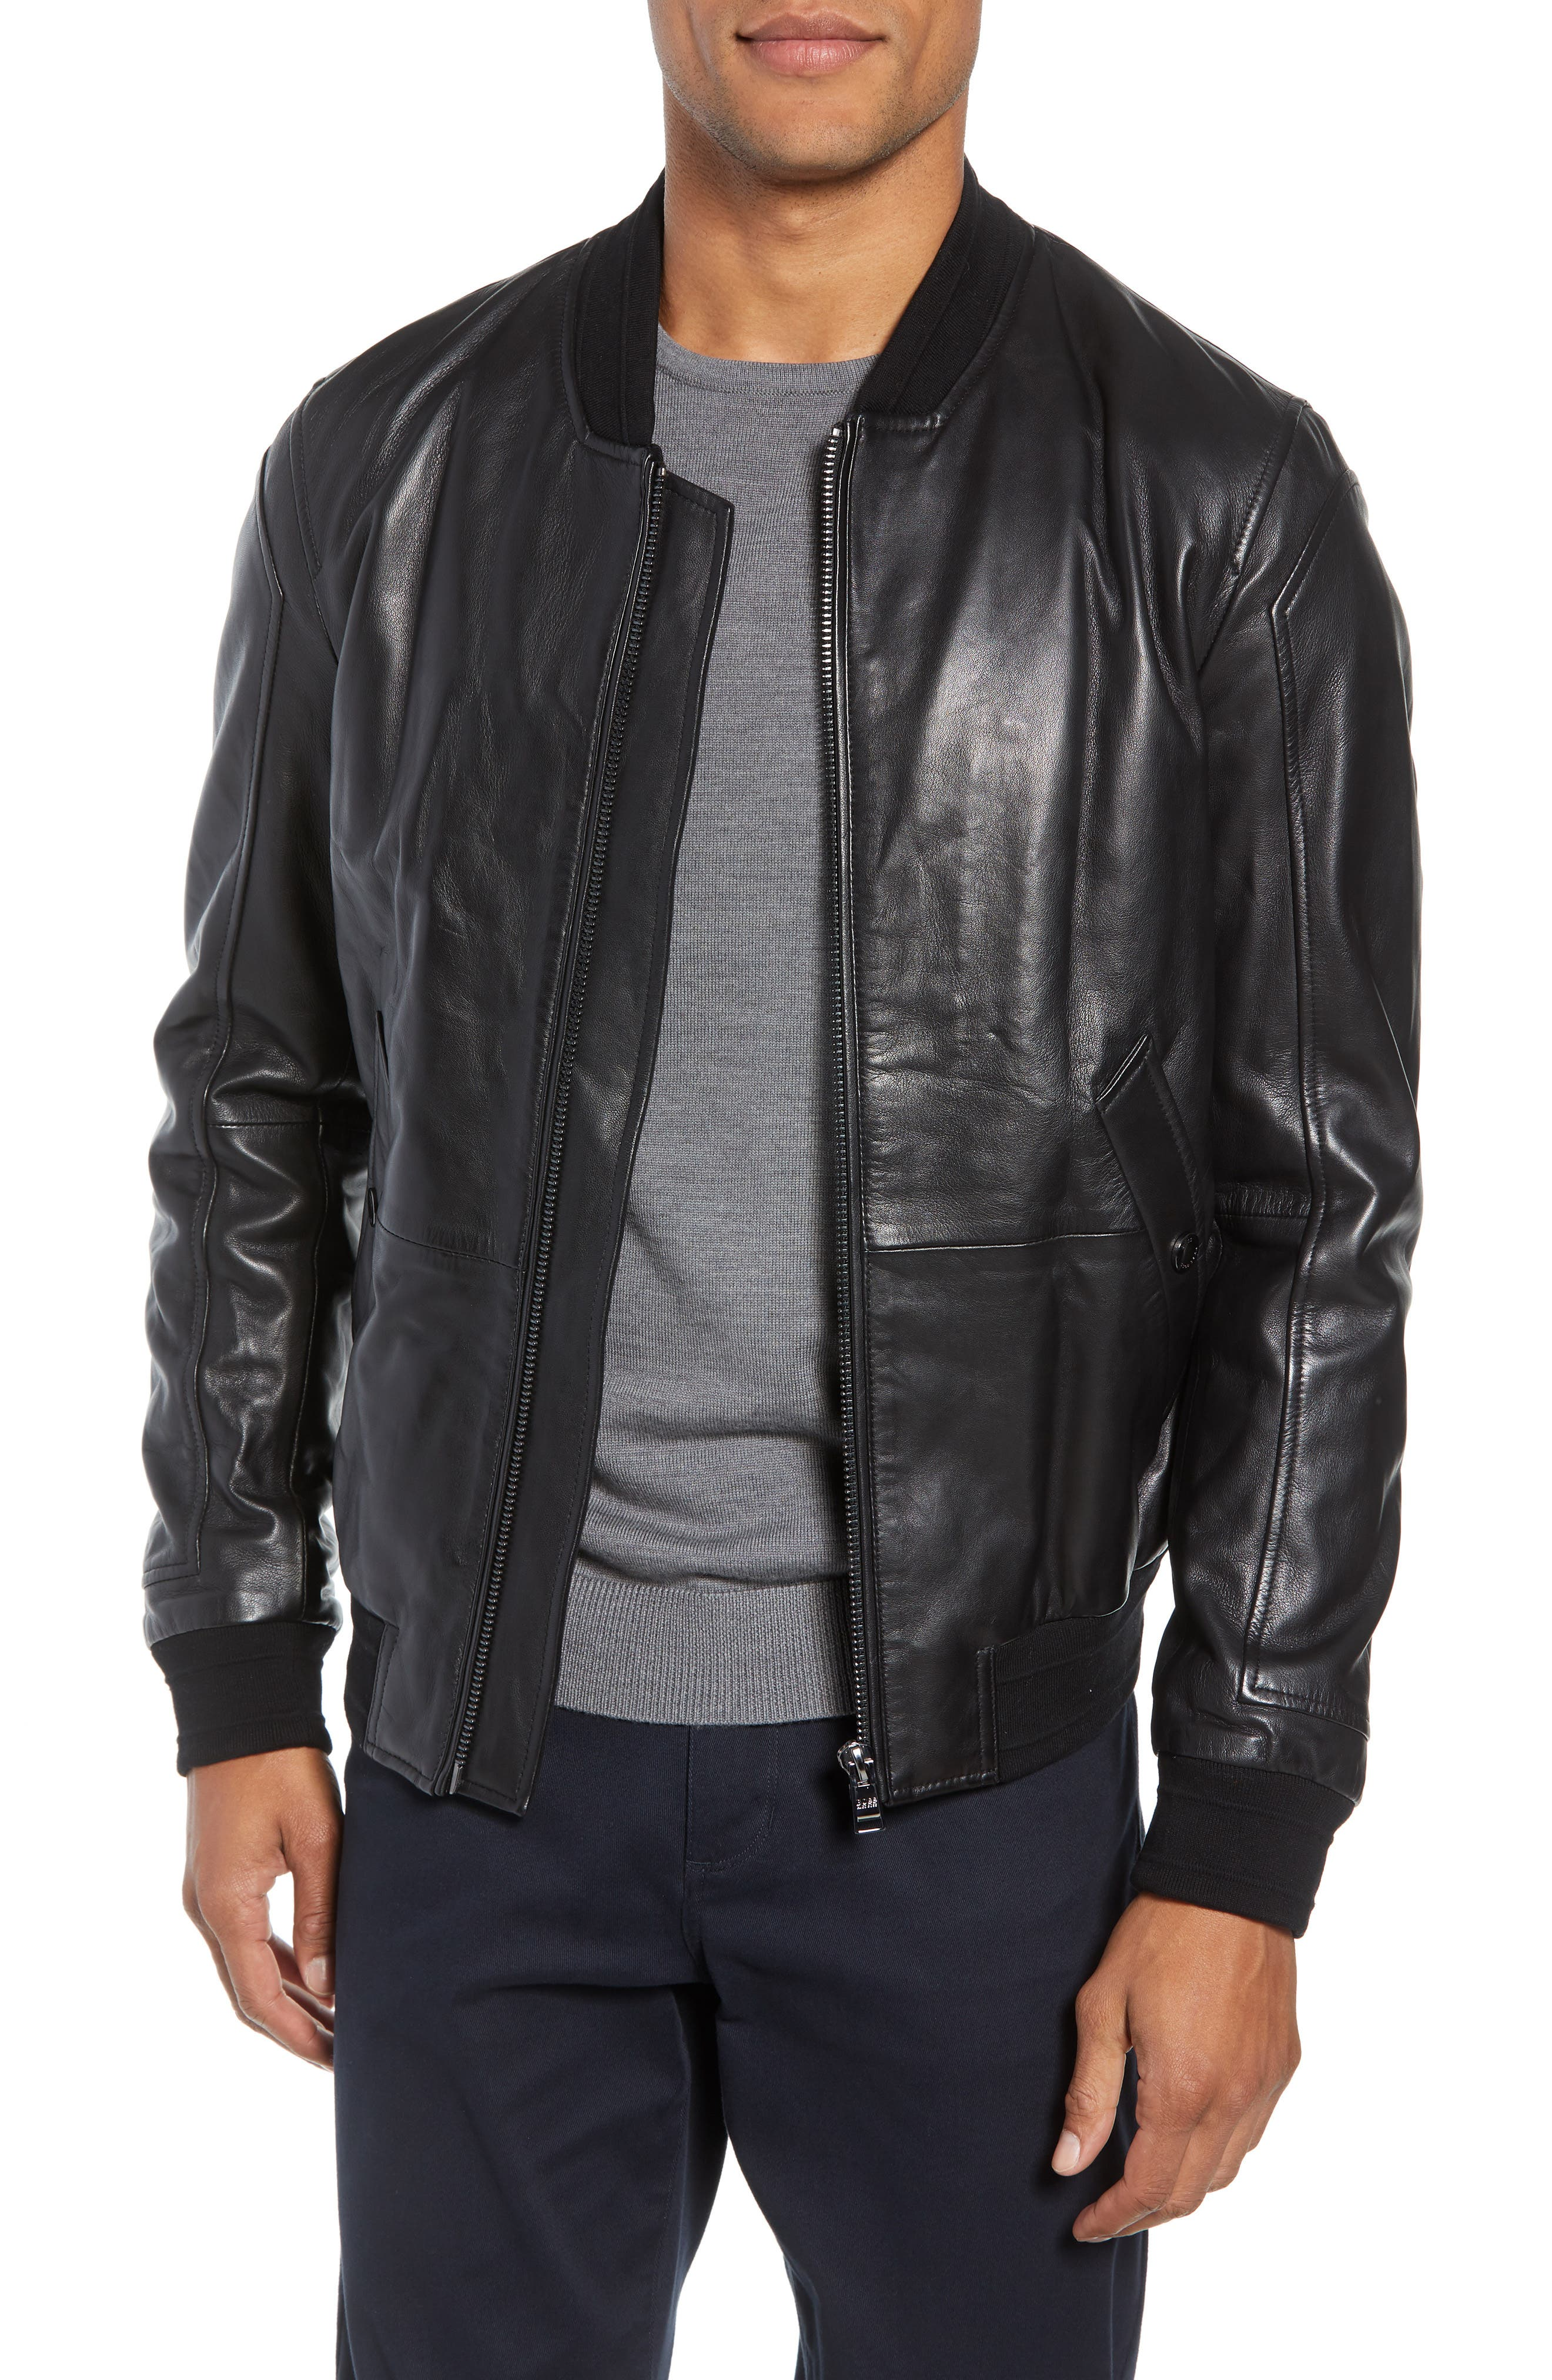 Arinos Leather Bomber Jacket,                             Main thumbnail 1, color,                             BLACK